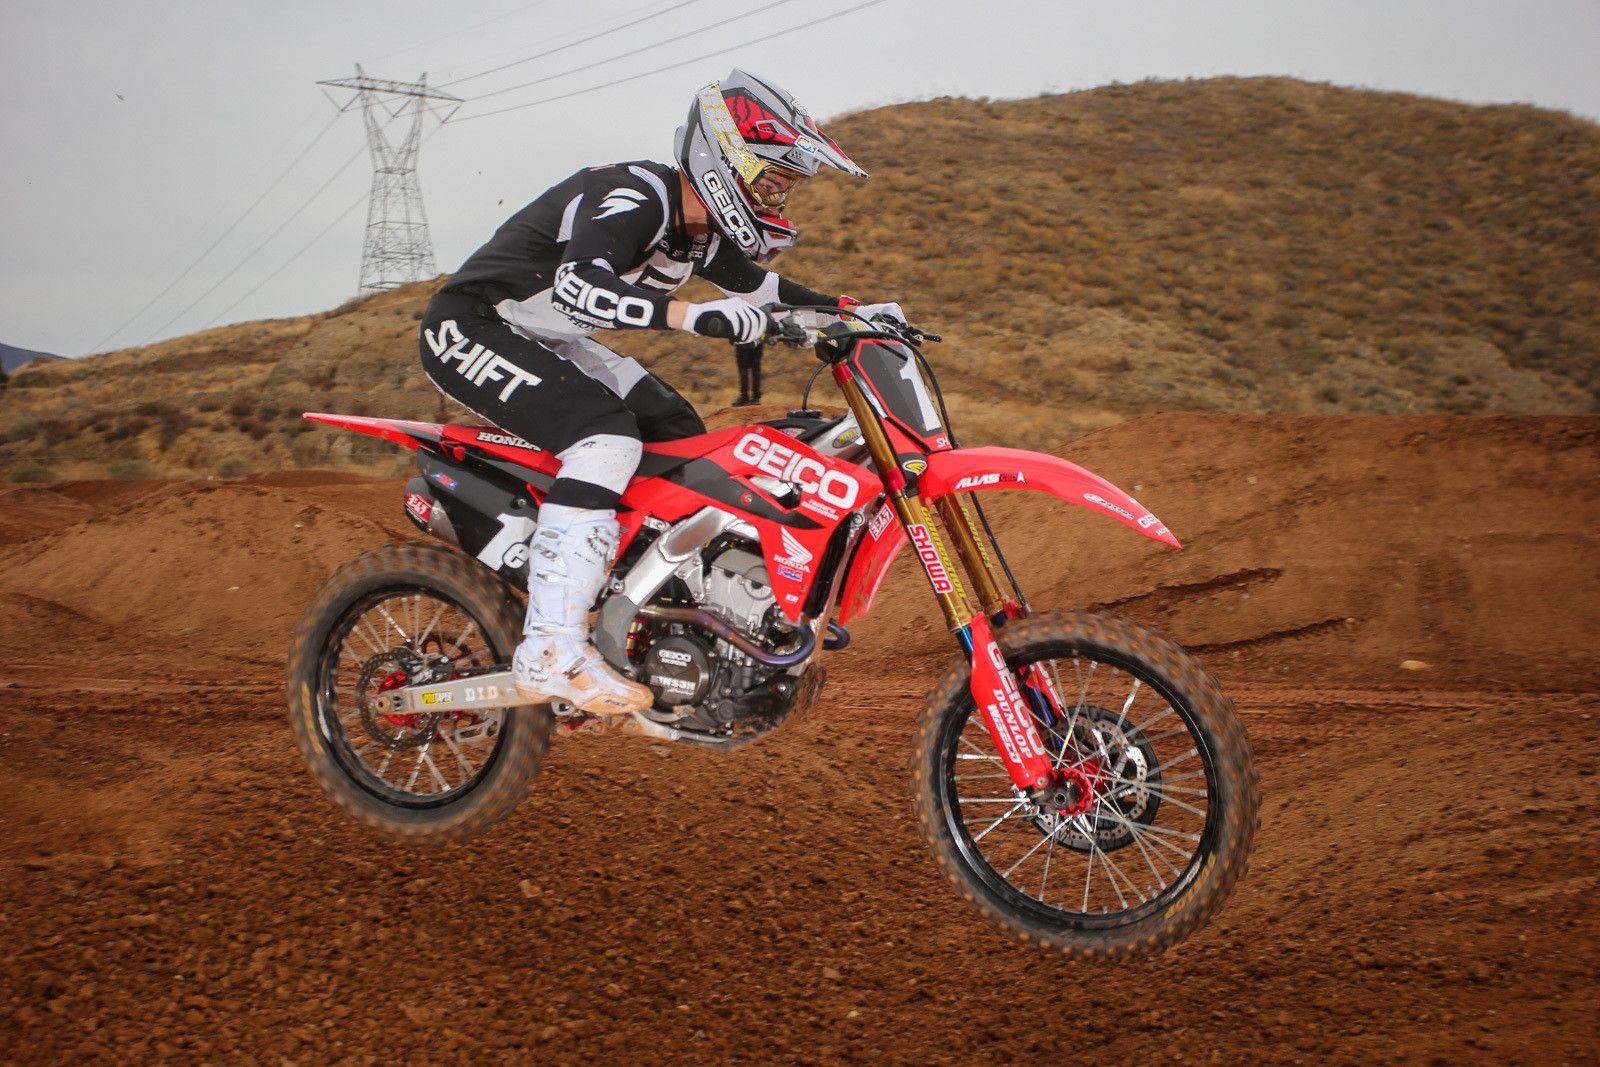 Seeing Red Honda 2020 Team Intro Motocross Feature Stories Vital Mx Motocross Honda Trail Riding